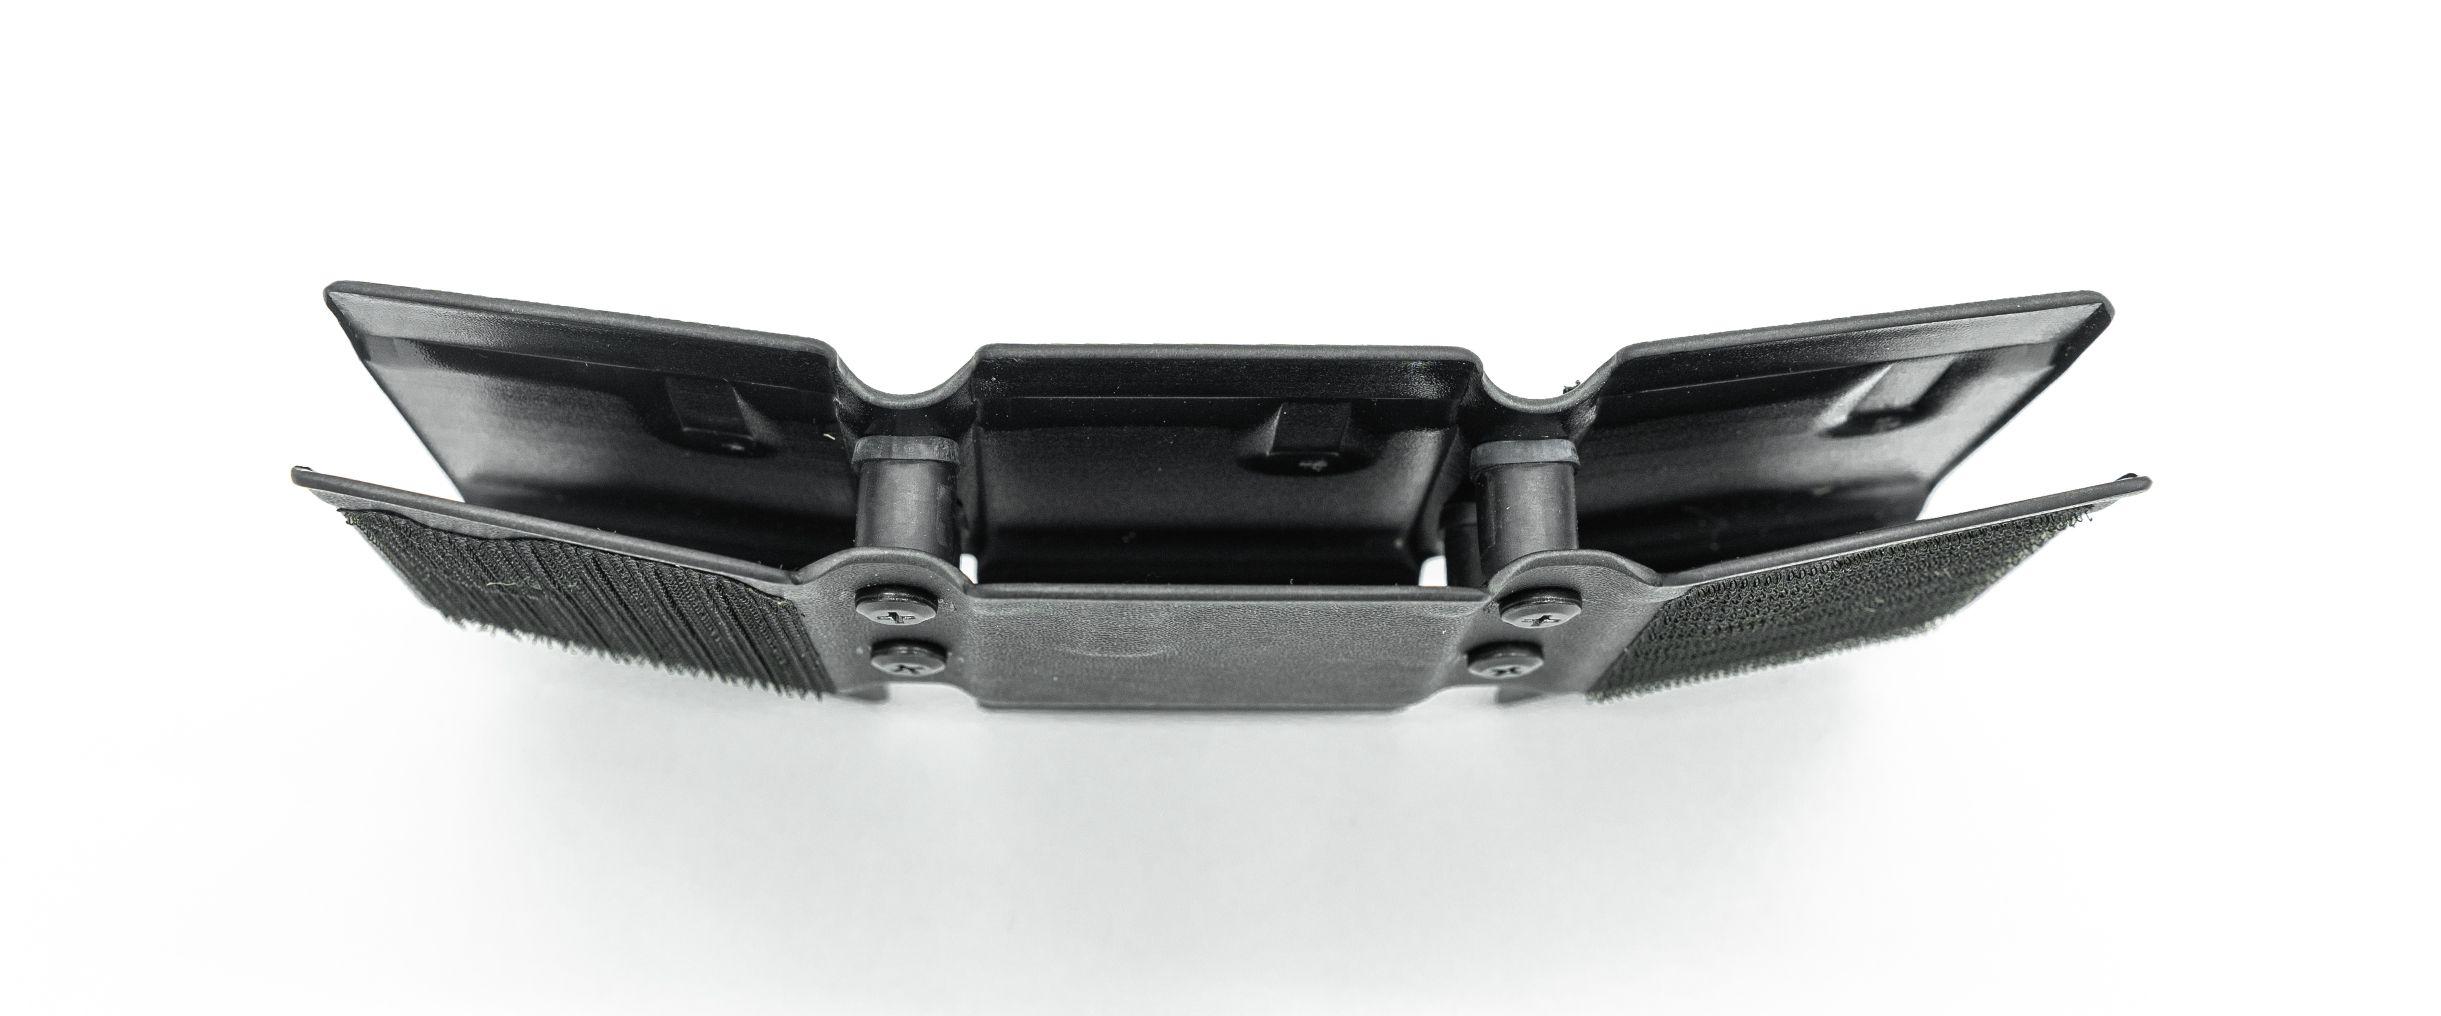 anr design spiritus systems ghidorah-s 556 placard micro flight kangaroo pouch chest rig